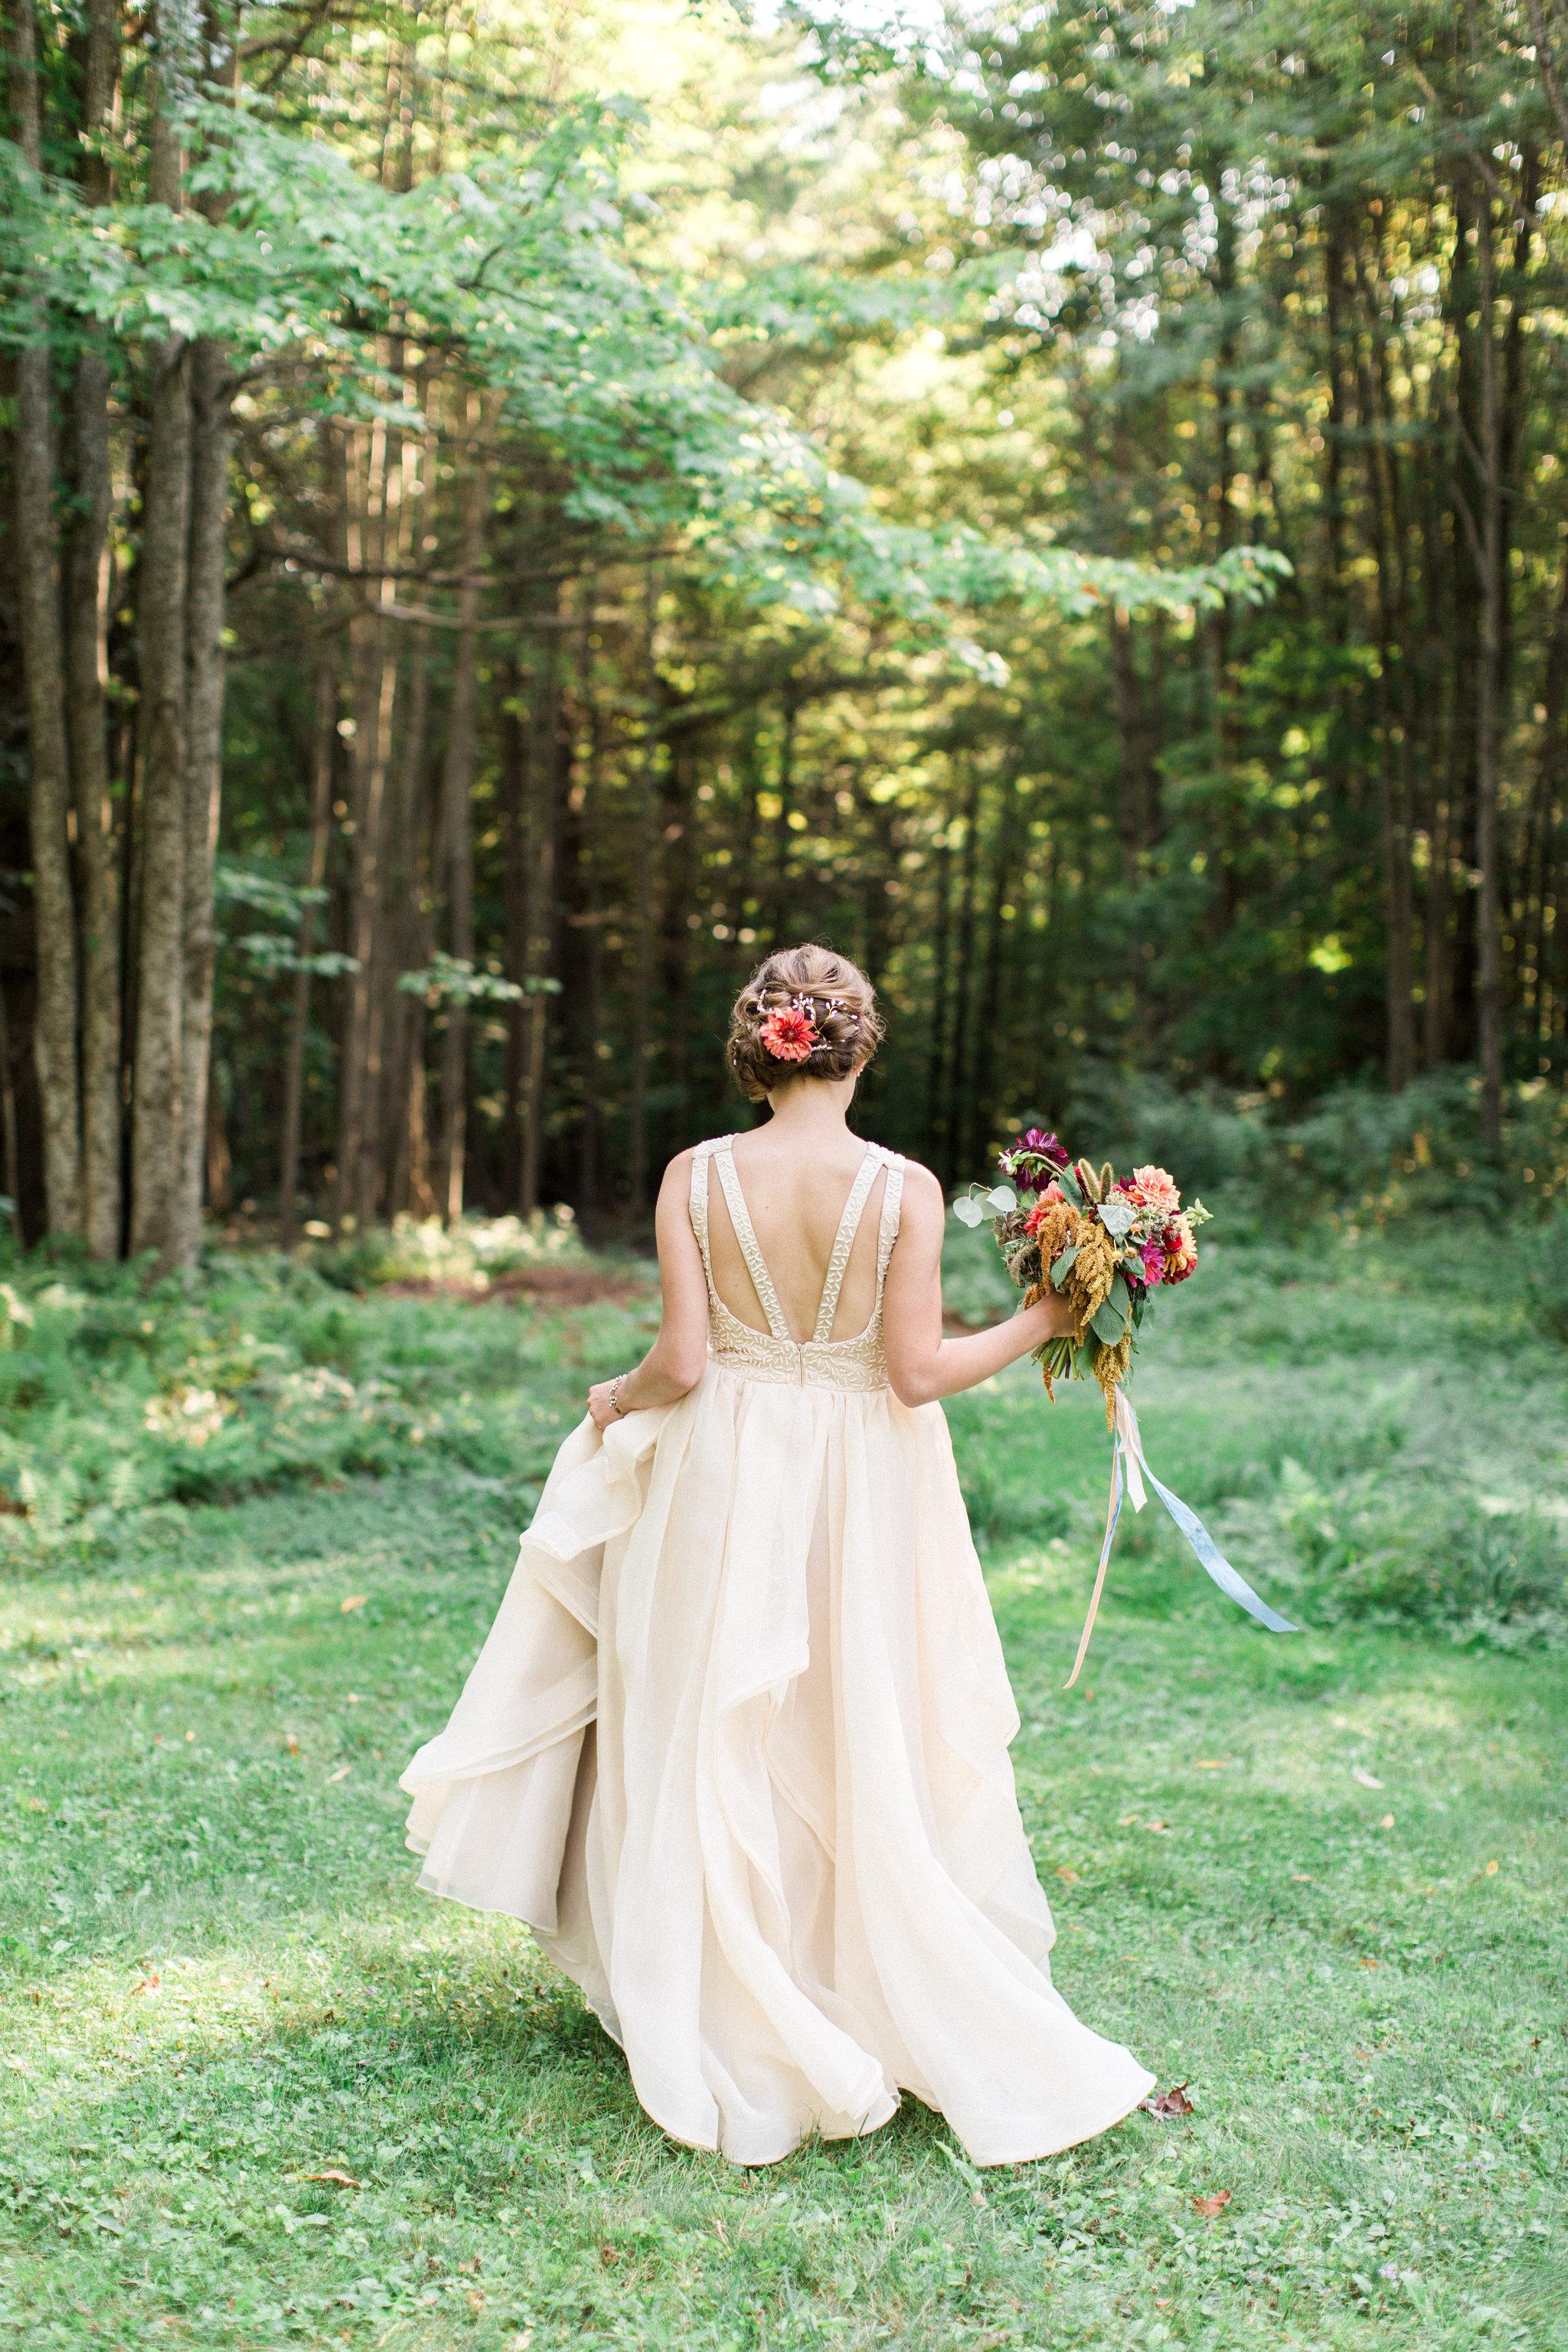 Fall wedding flowers by Nectar & Root | Wedding floral design services in Burlington, Vermont (VT) | Autumn bouquet of dahlias, eucalyptus, amaranth